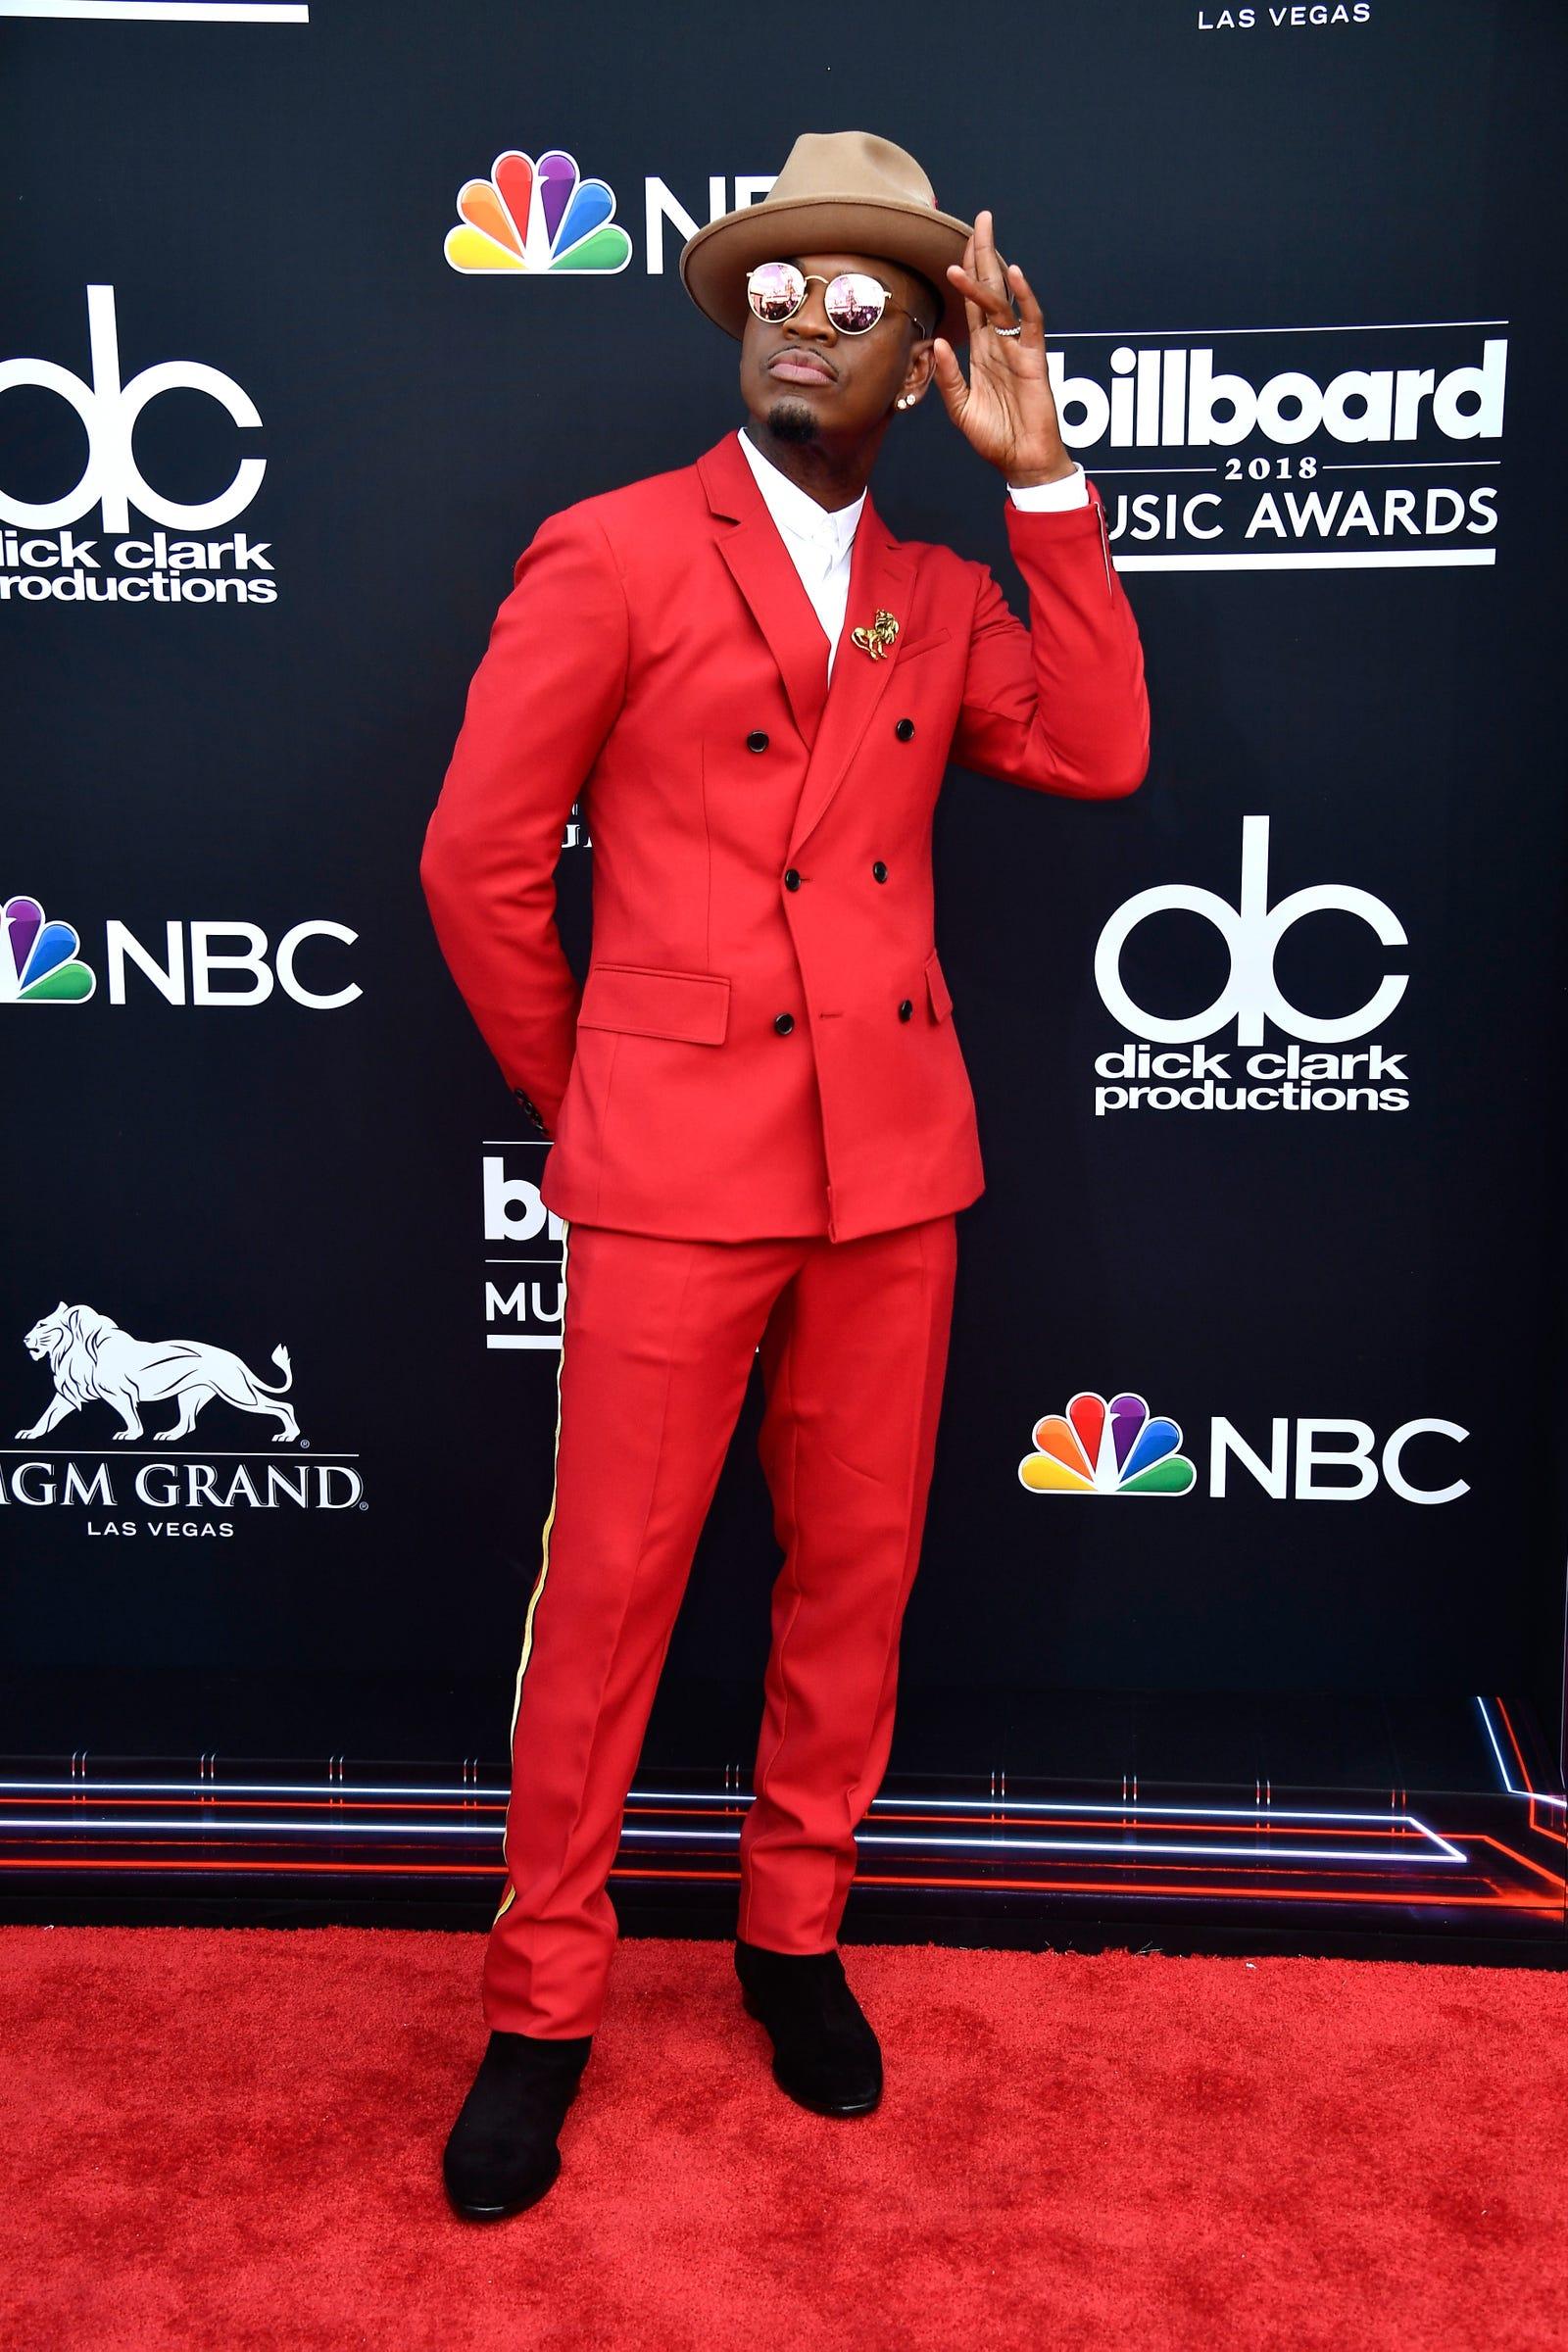 Ne-Yo at 2018 Billboard Music Awards May 20, 2018, in Las Vegas